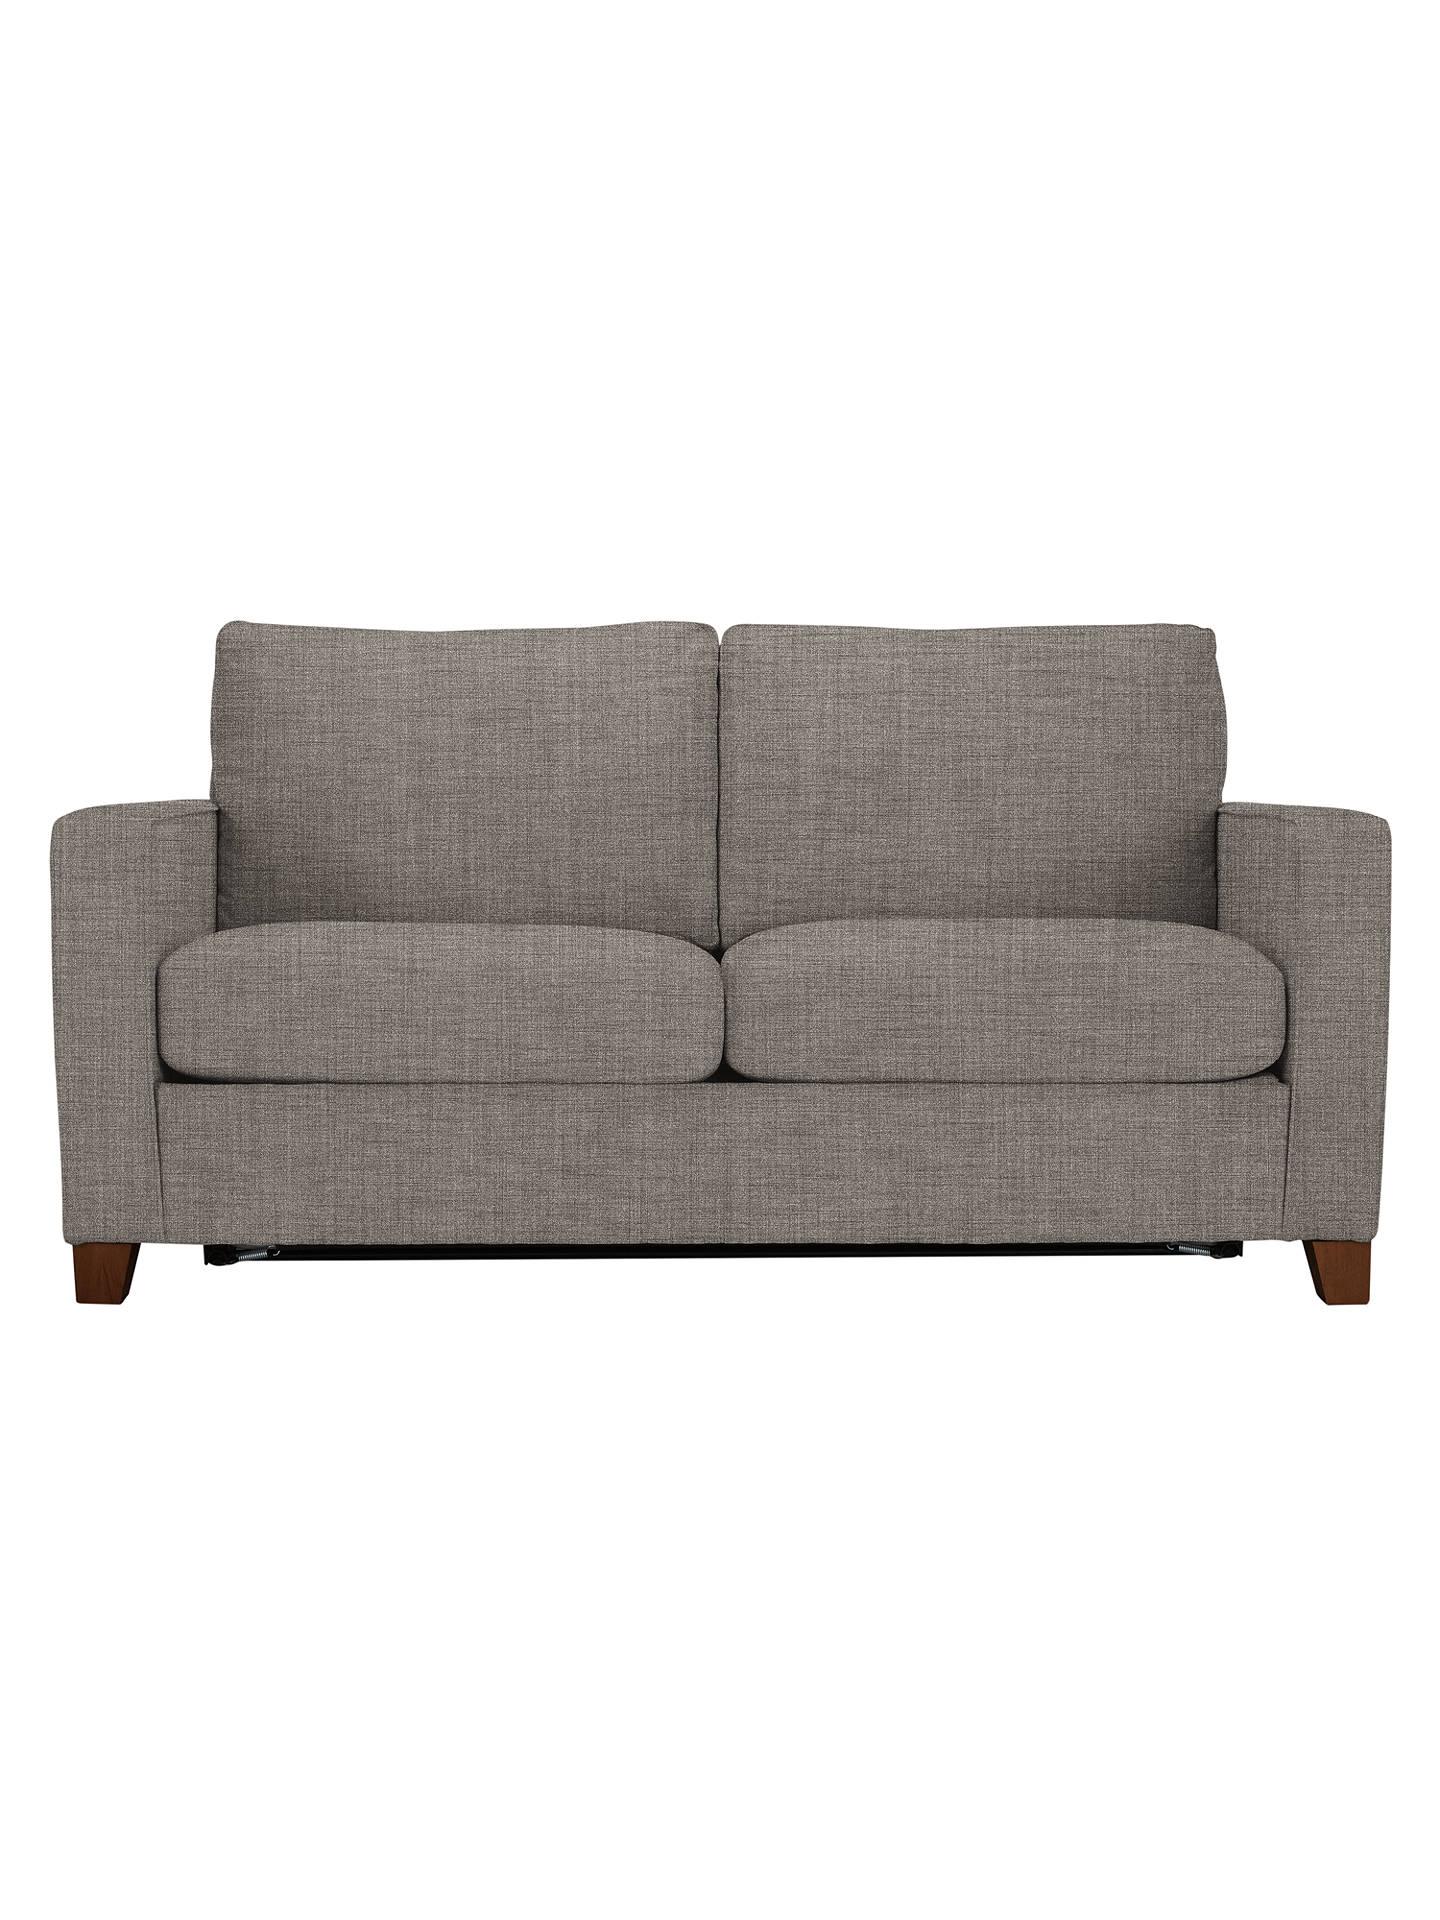 john lewis the basics jackson medium 2 seater sofa bed. Black Bedroom Furniture Sets. Home Design Ideas